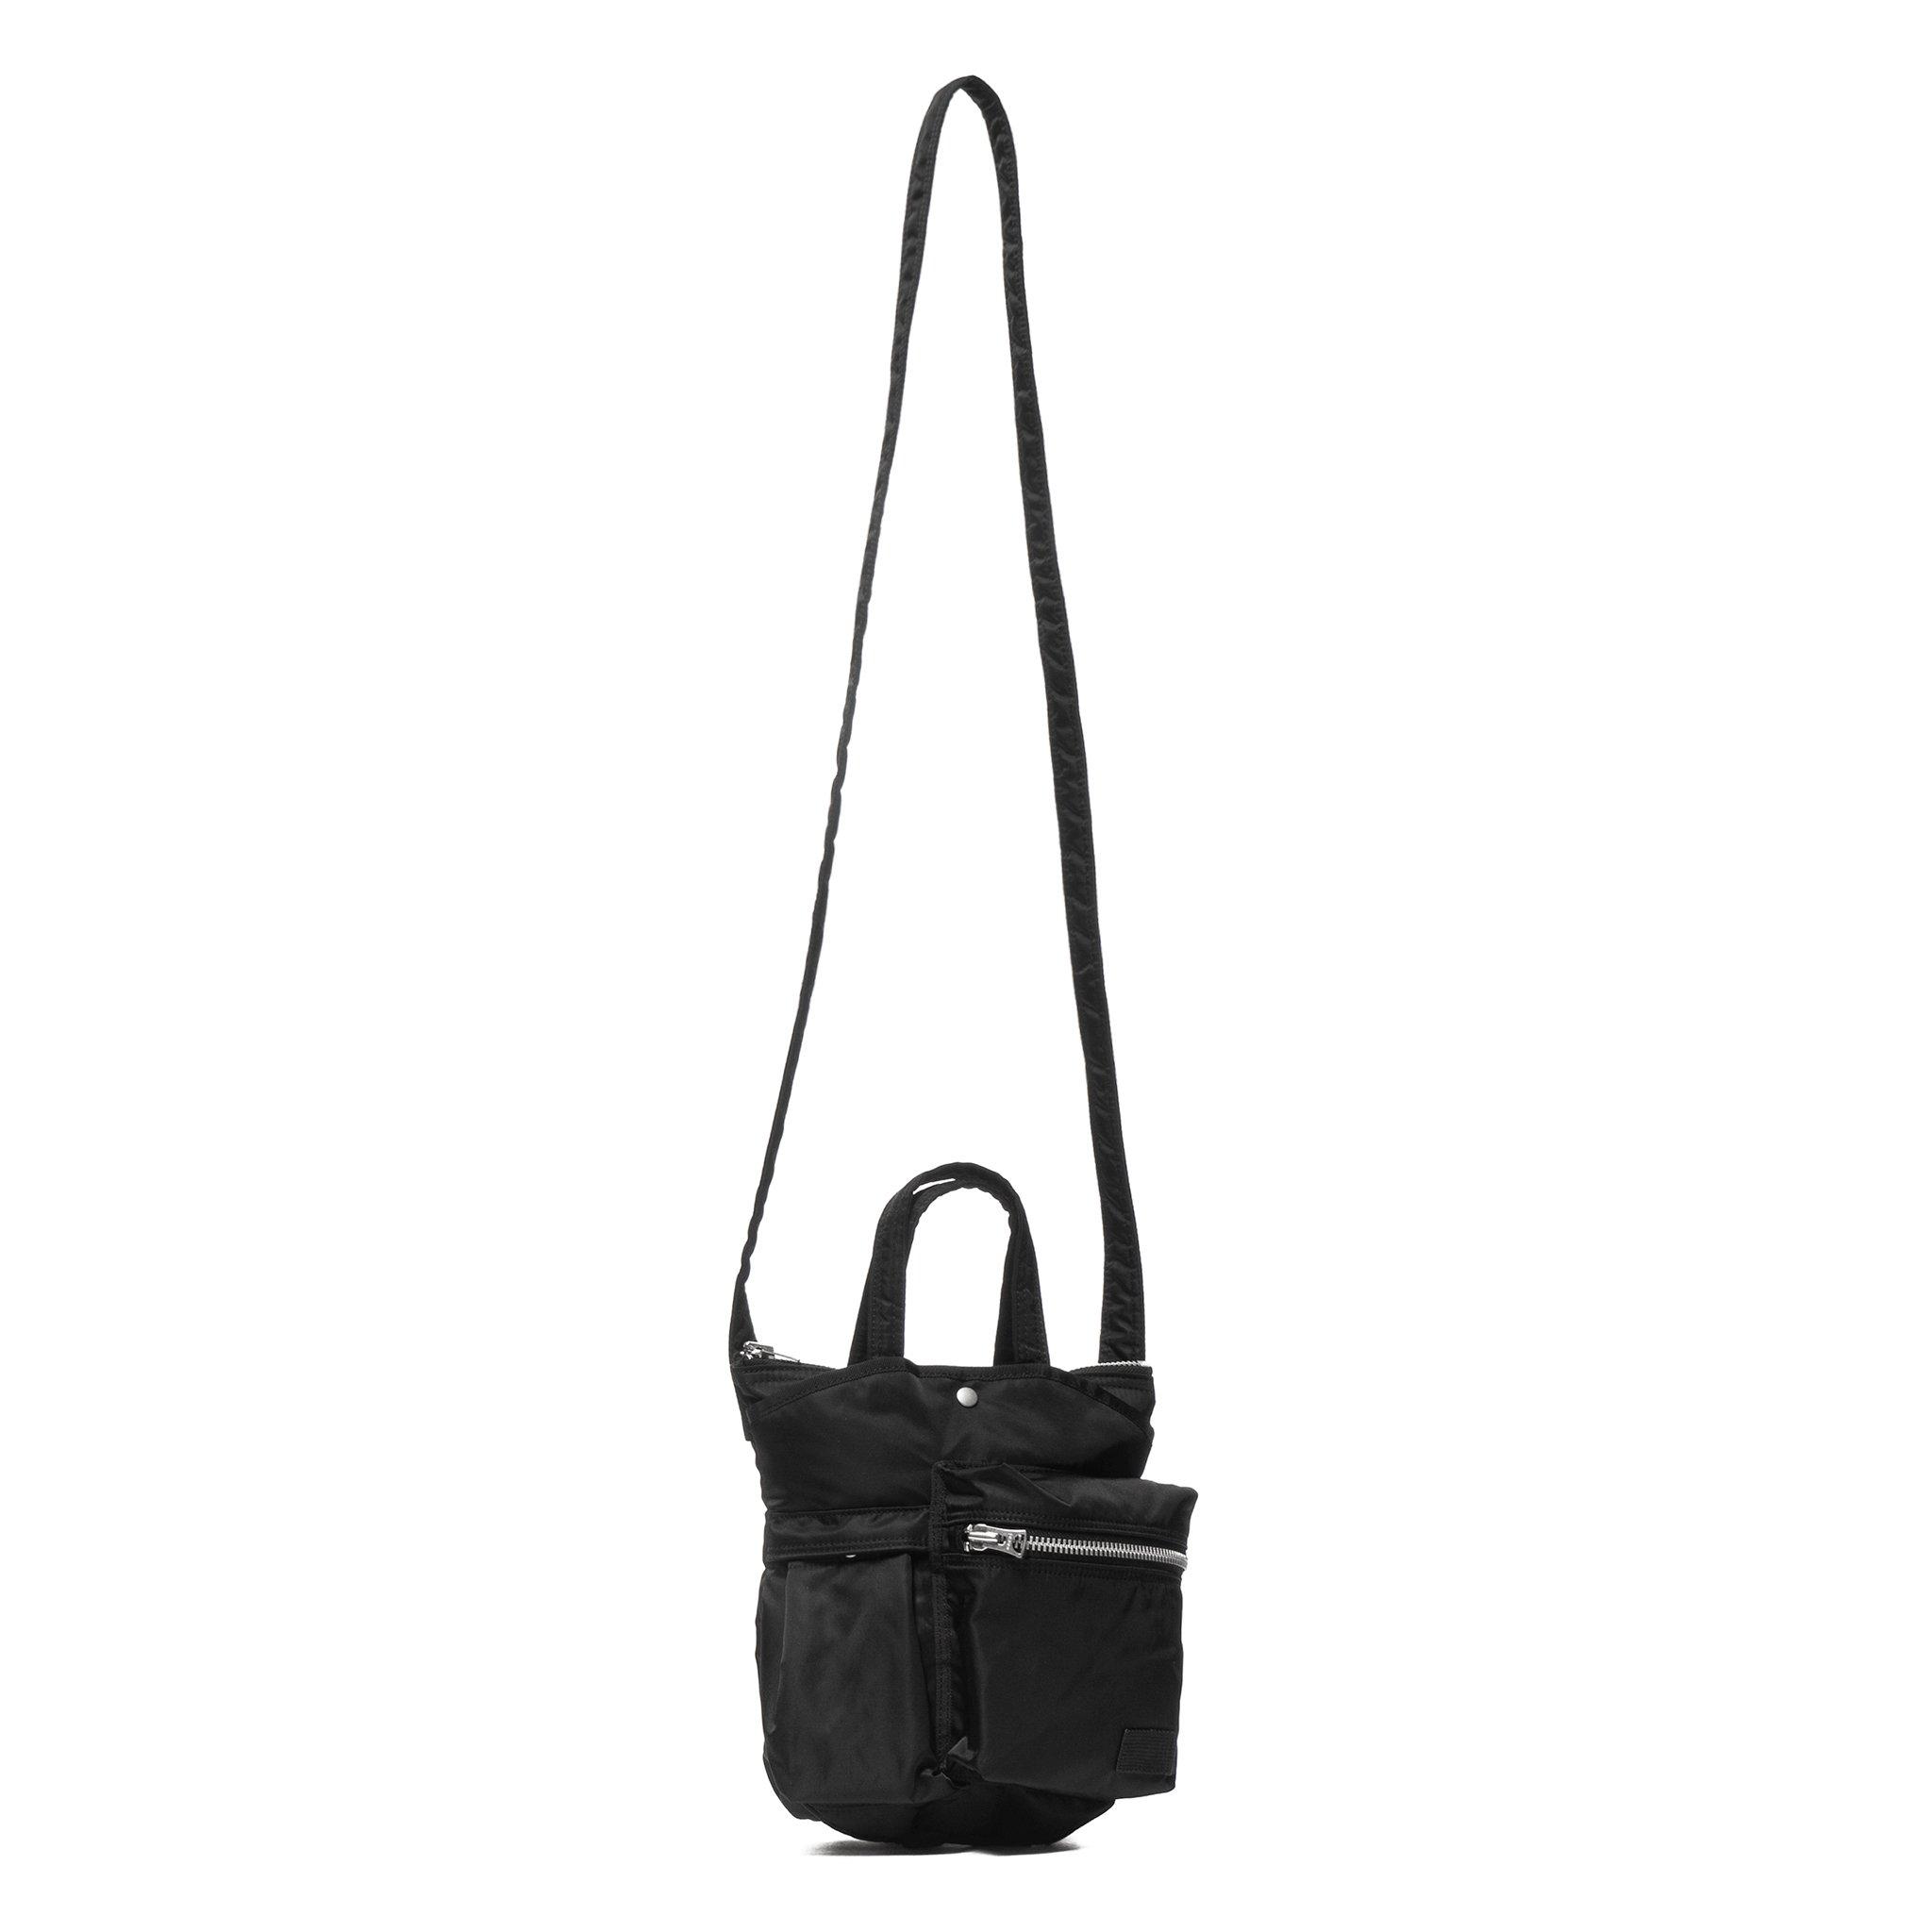 HAVEN-Sacai-Pocket-Bag-Large-BLACK-1_2048x2048.progressive.jpg